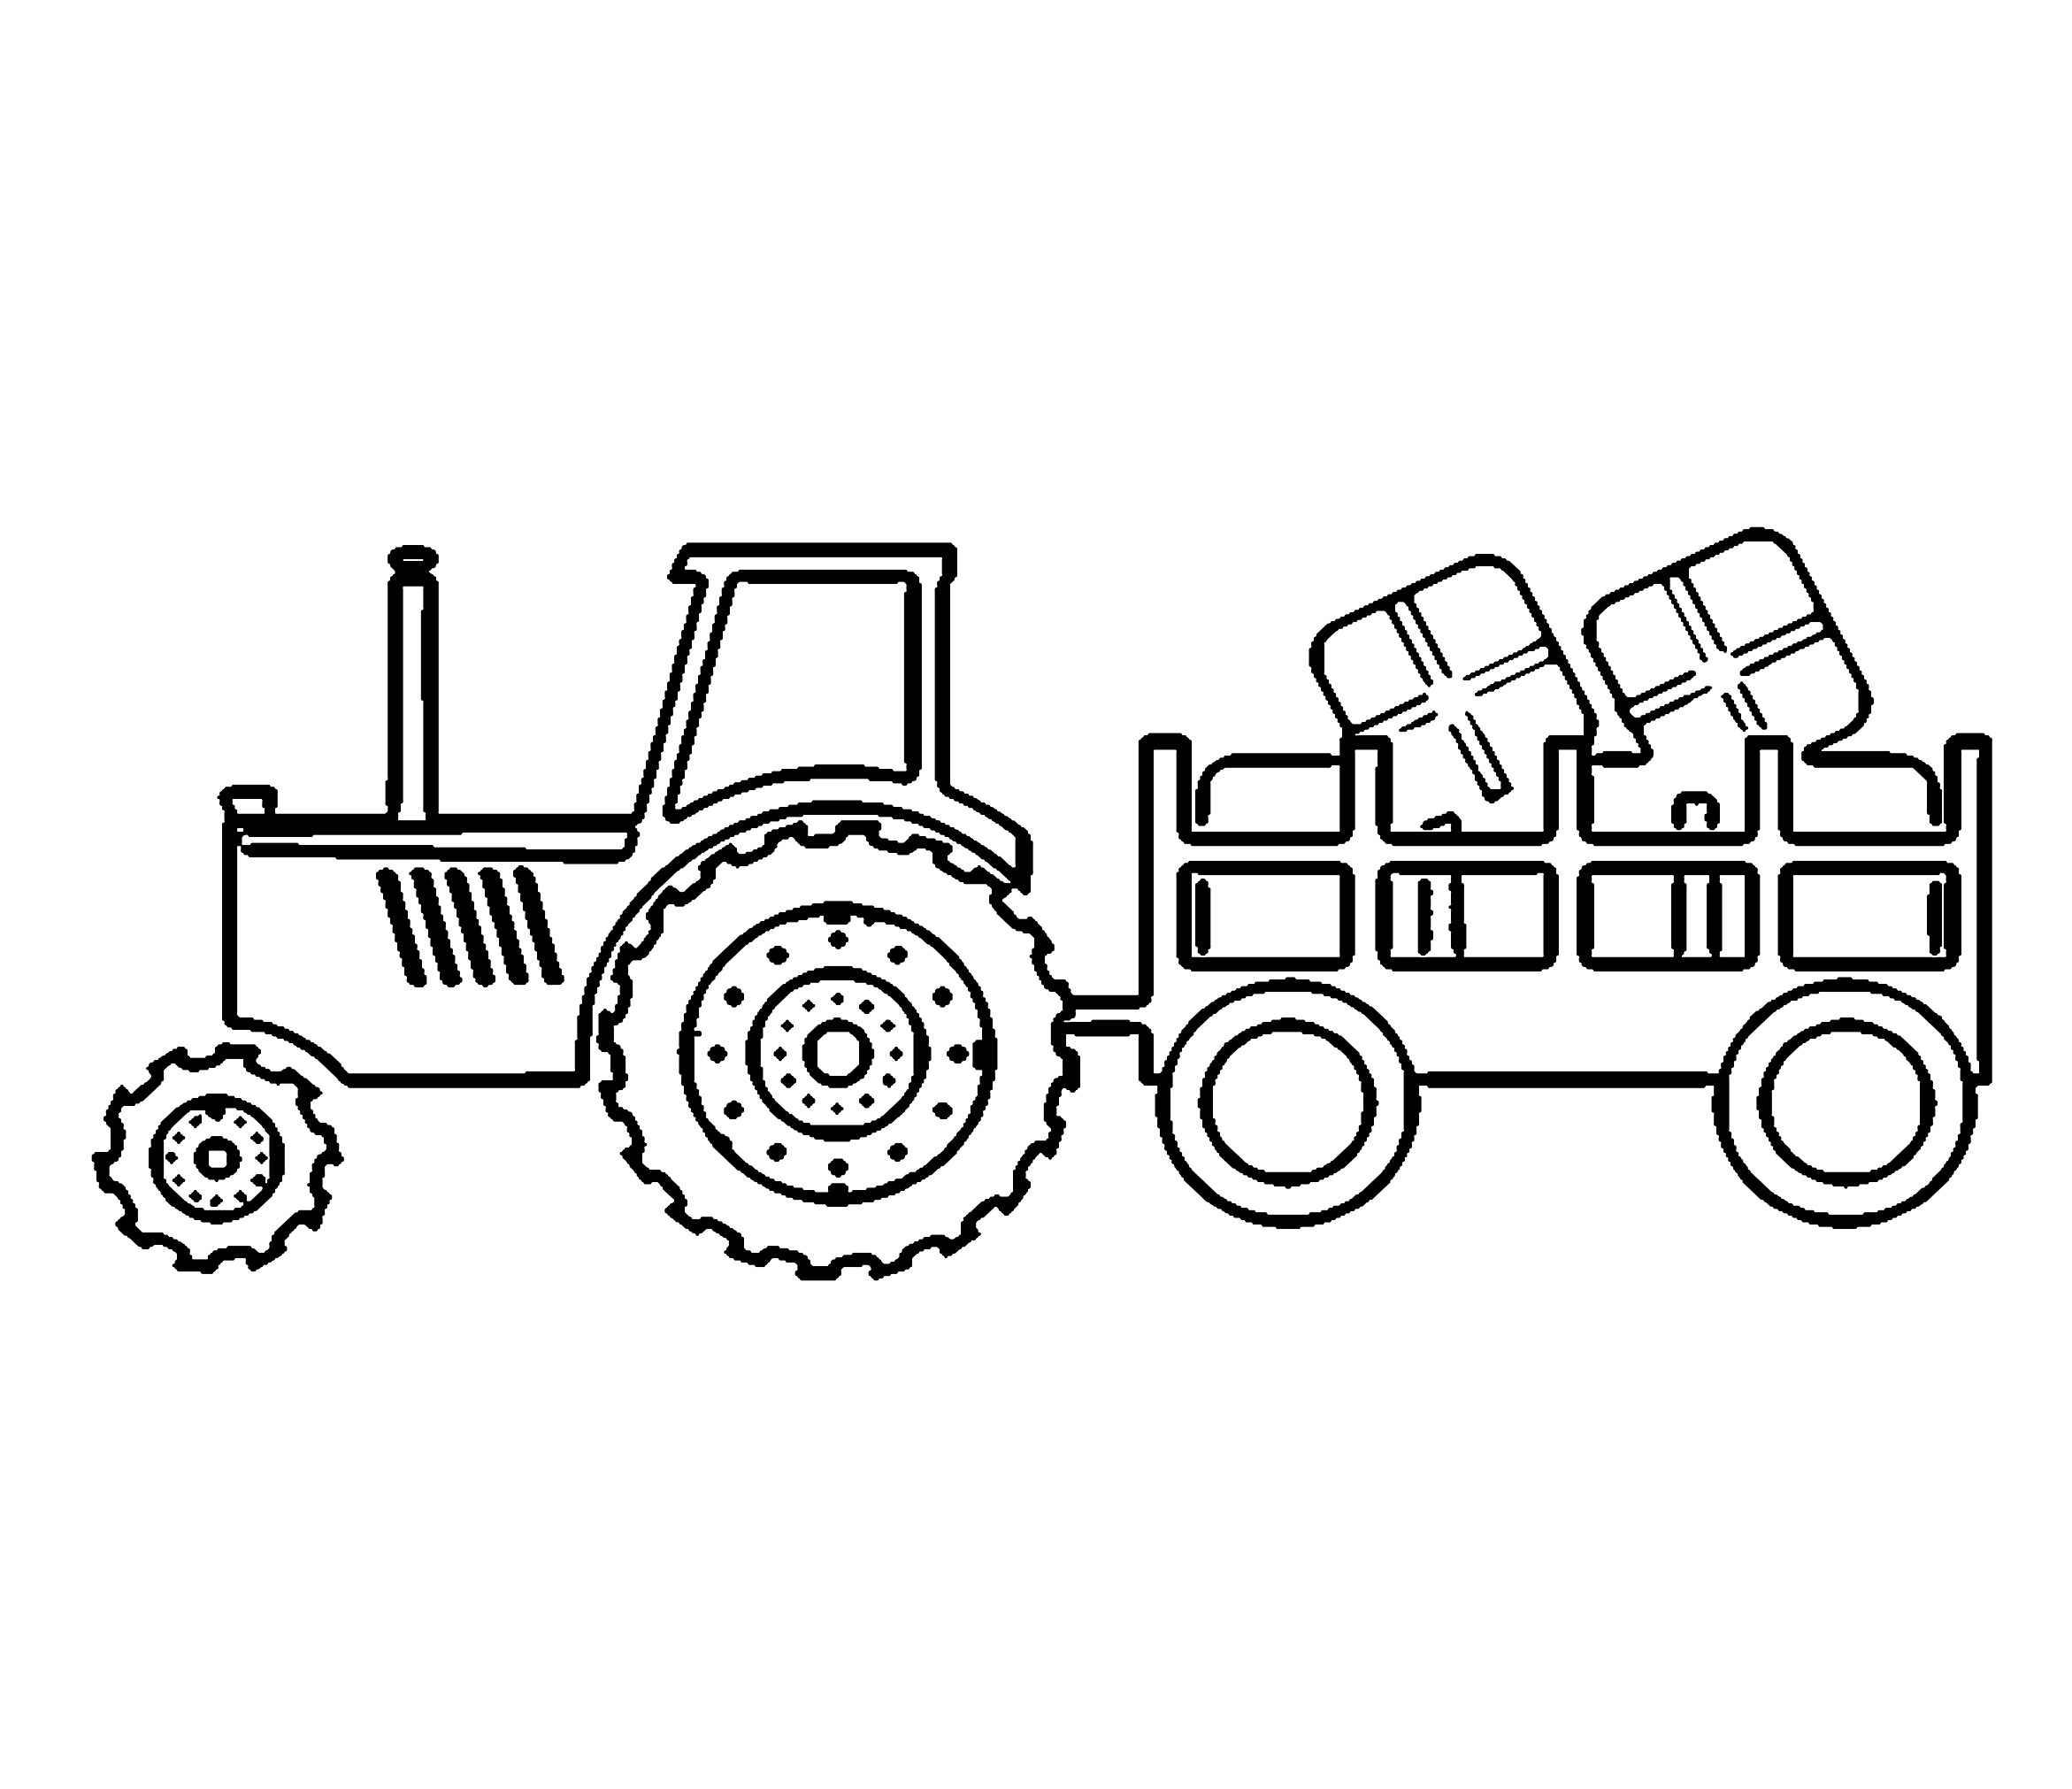 Fendt Beste Ausmalbilder Traktor Ausmalbilder Mandala Trecker Sketches Coloring Pages Art Ausmalbilder Traktor Fendt Ausmalbilder Traktor Ausmalbilder Ausmalbilder Zum Ausdrucken Esa Rice